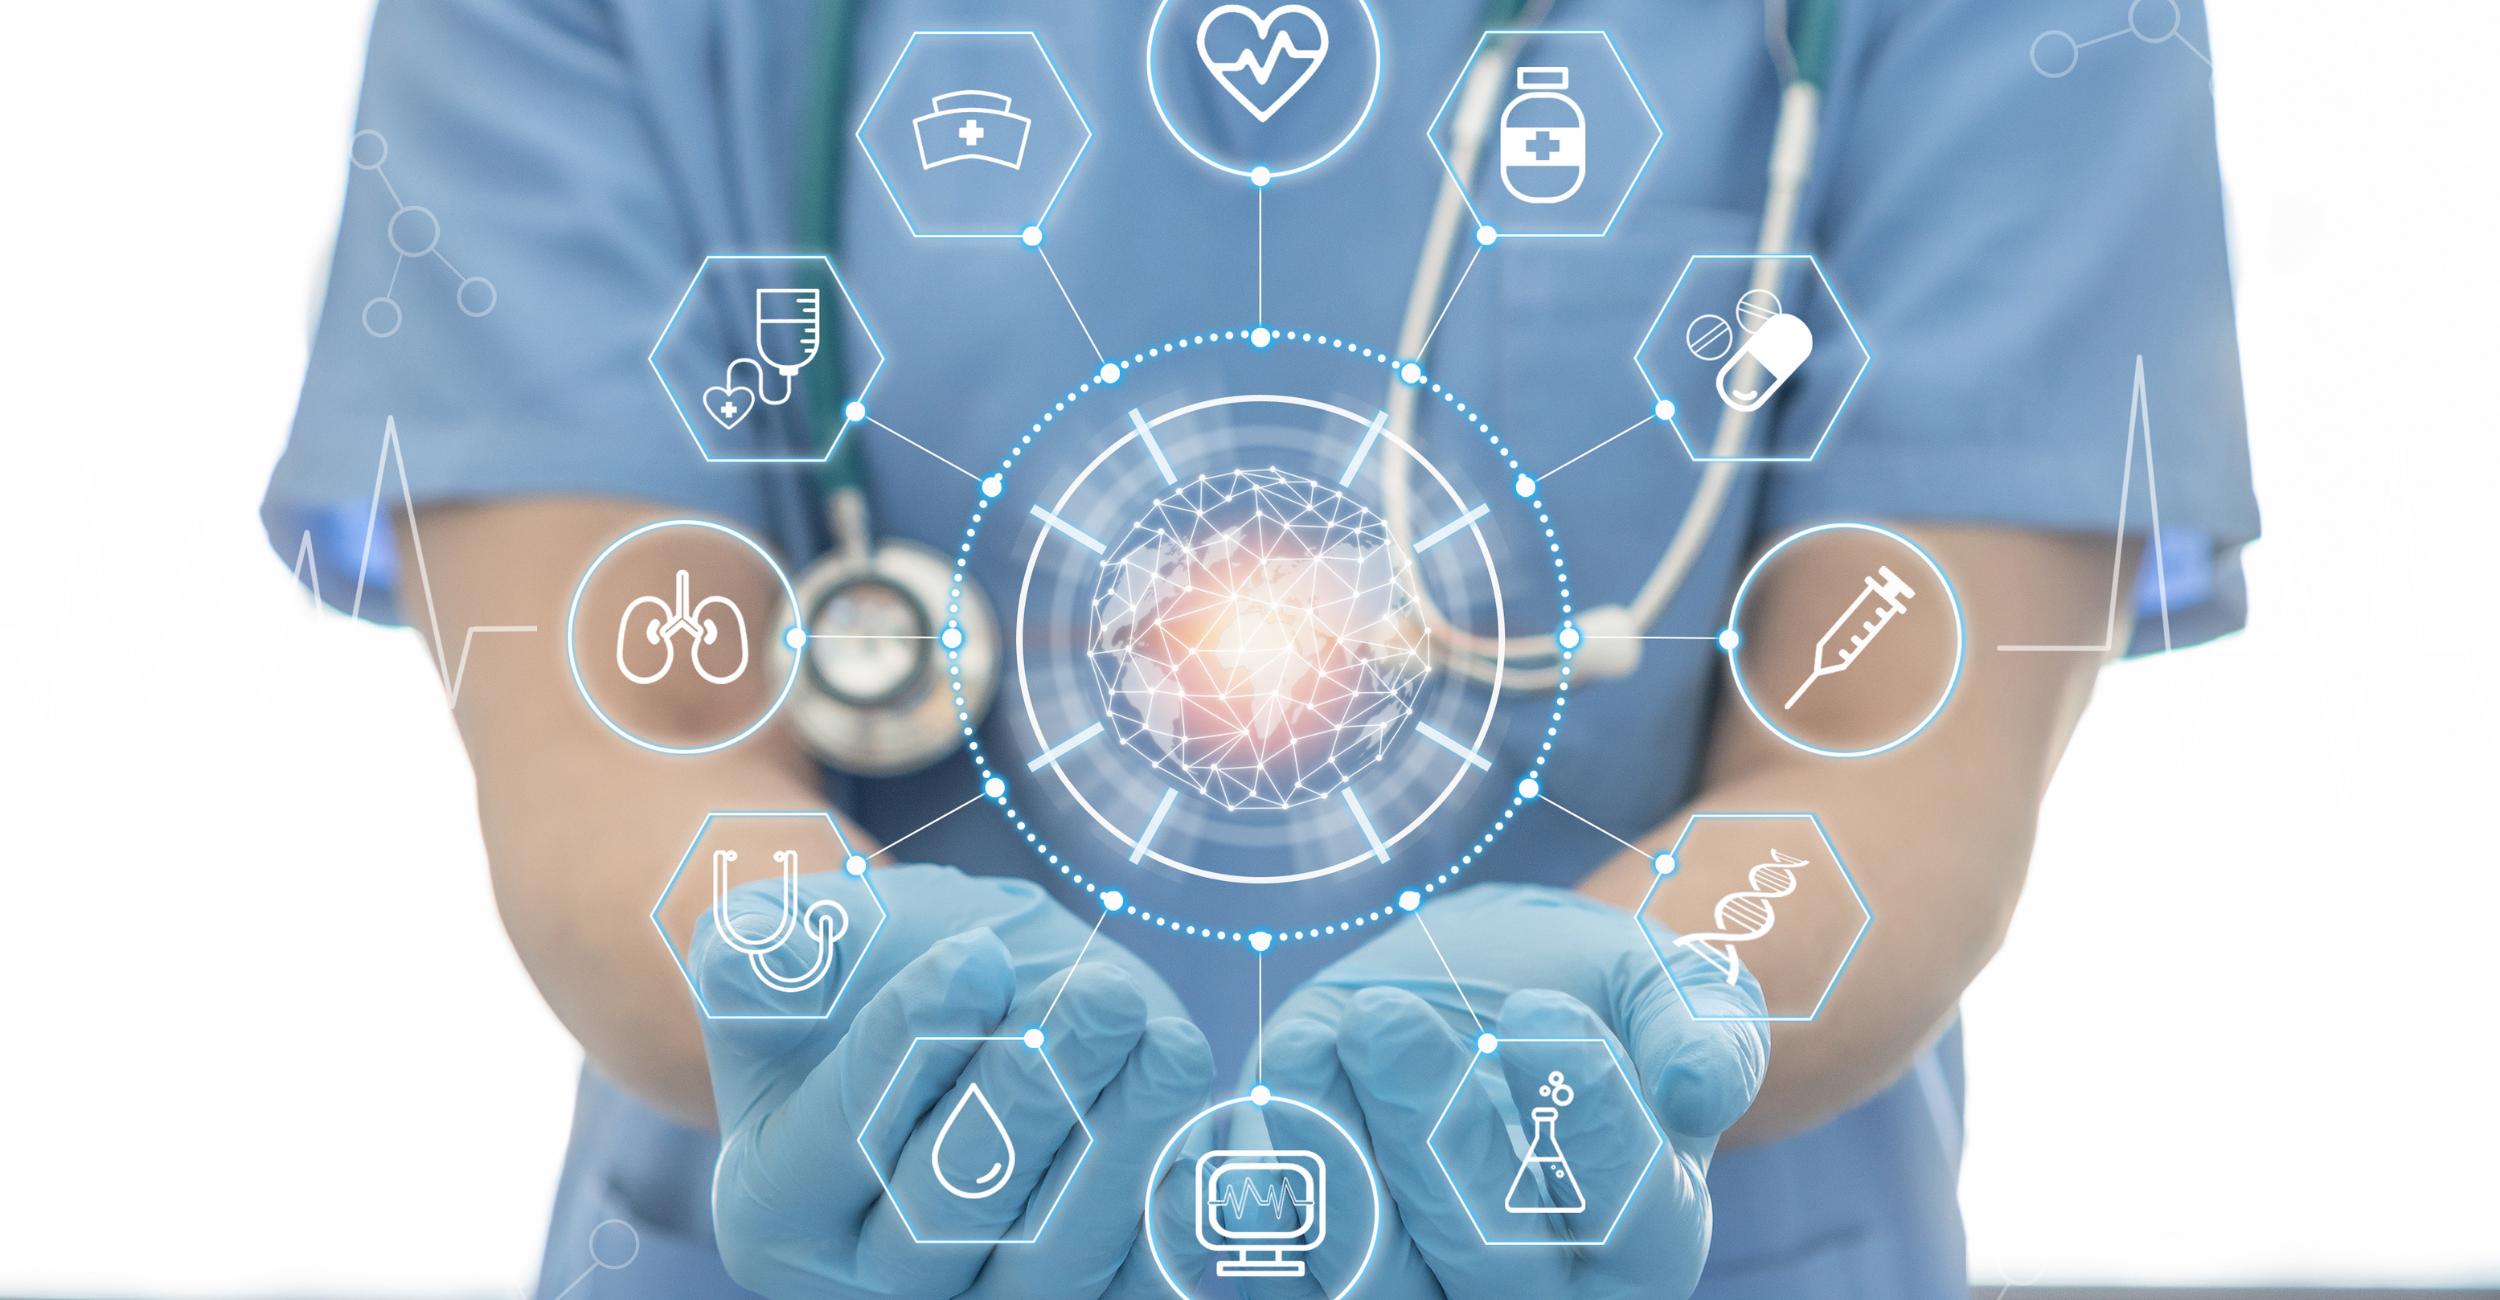 Seminário online gratuito debate futuro da saúde